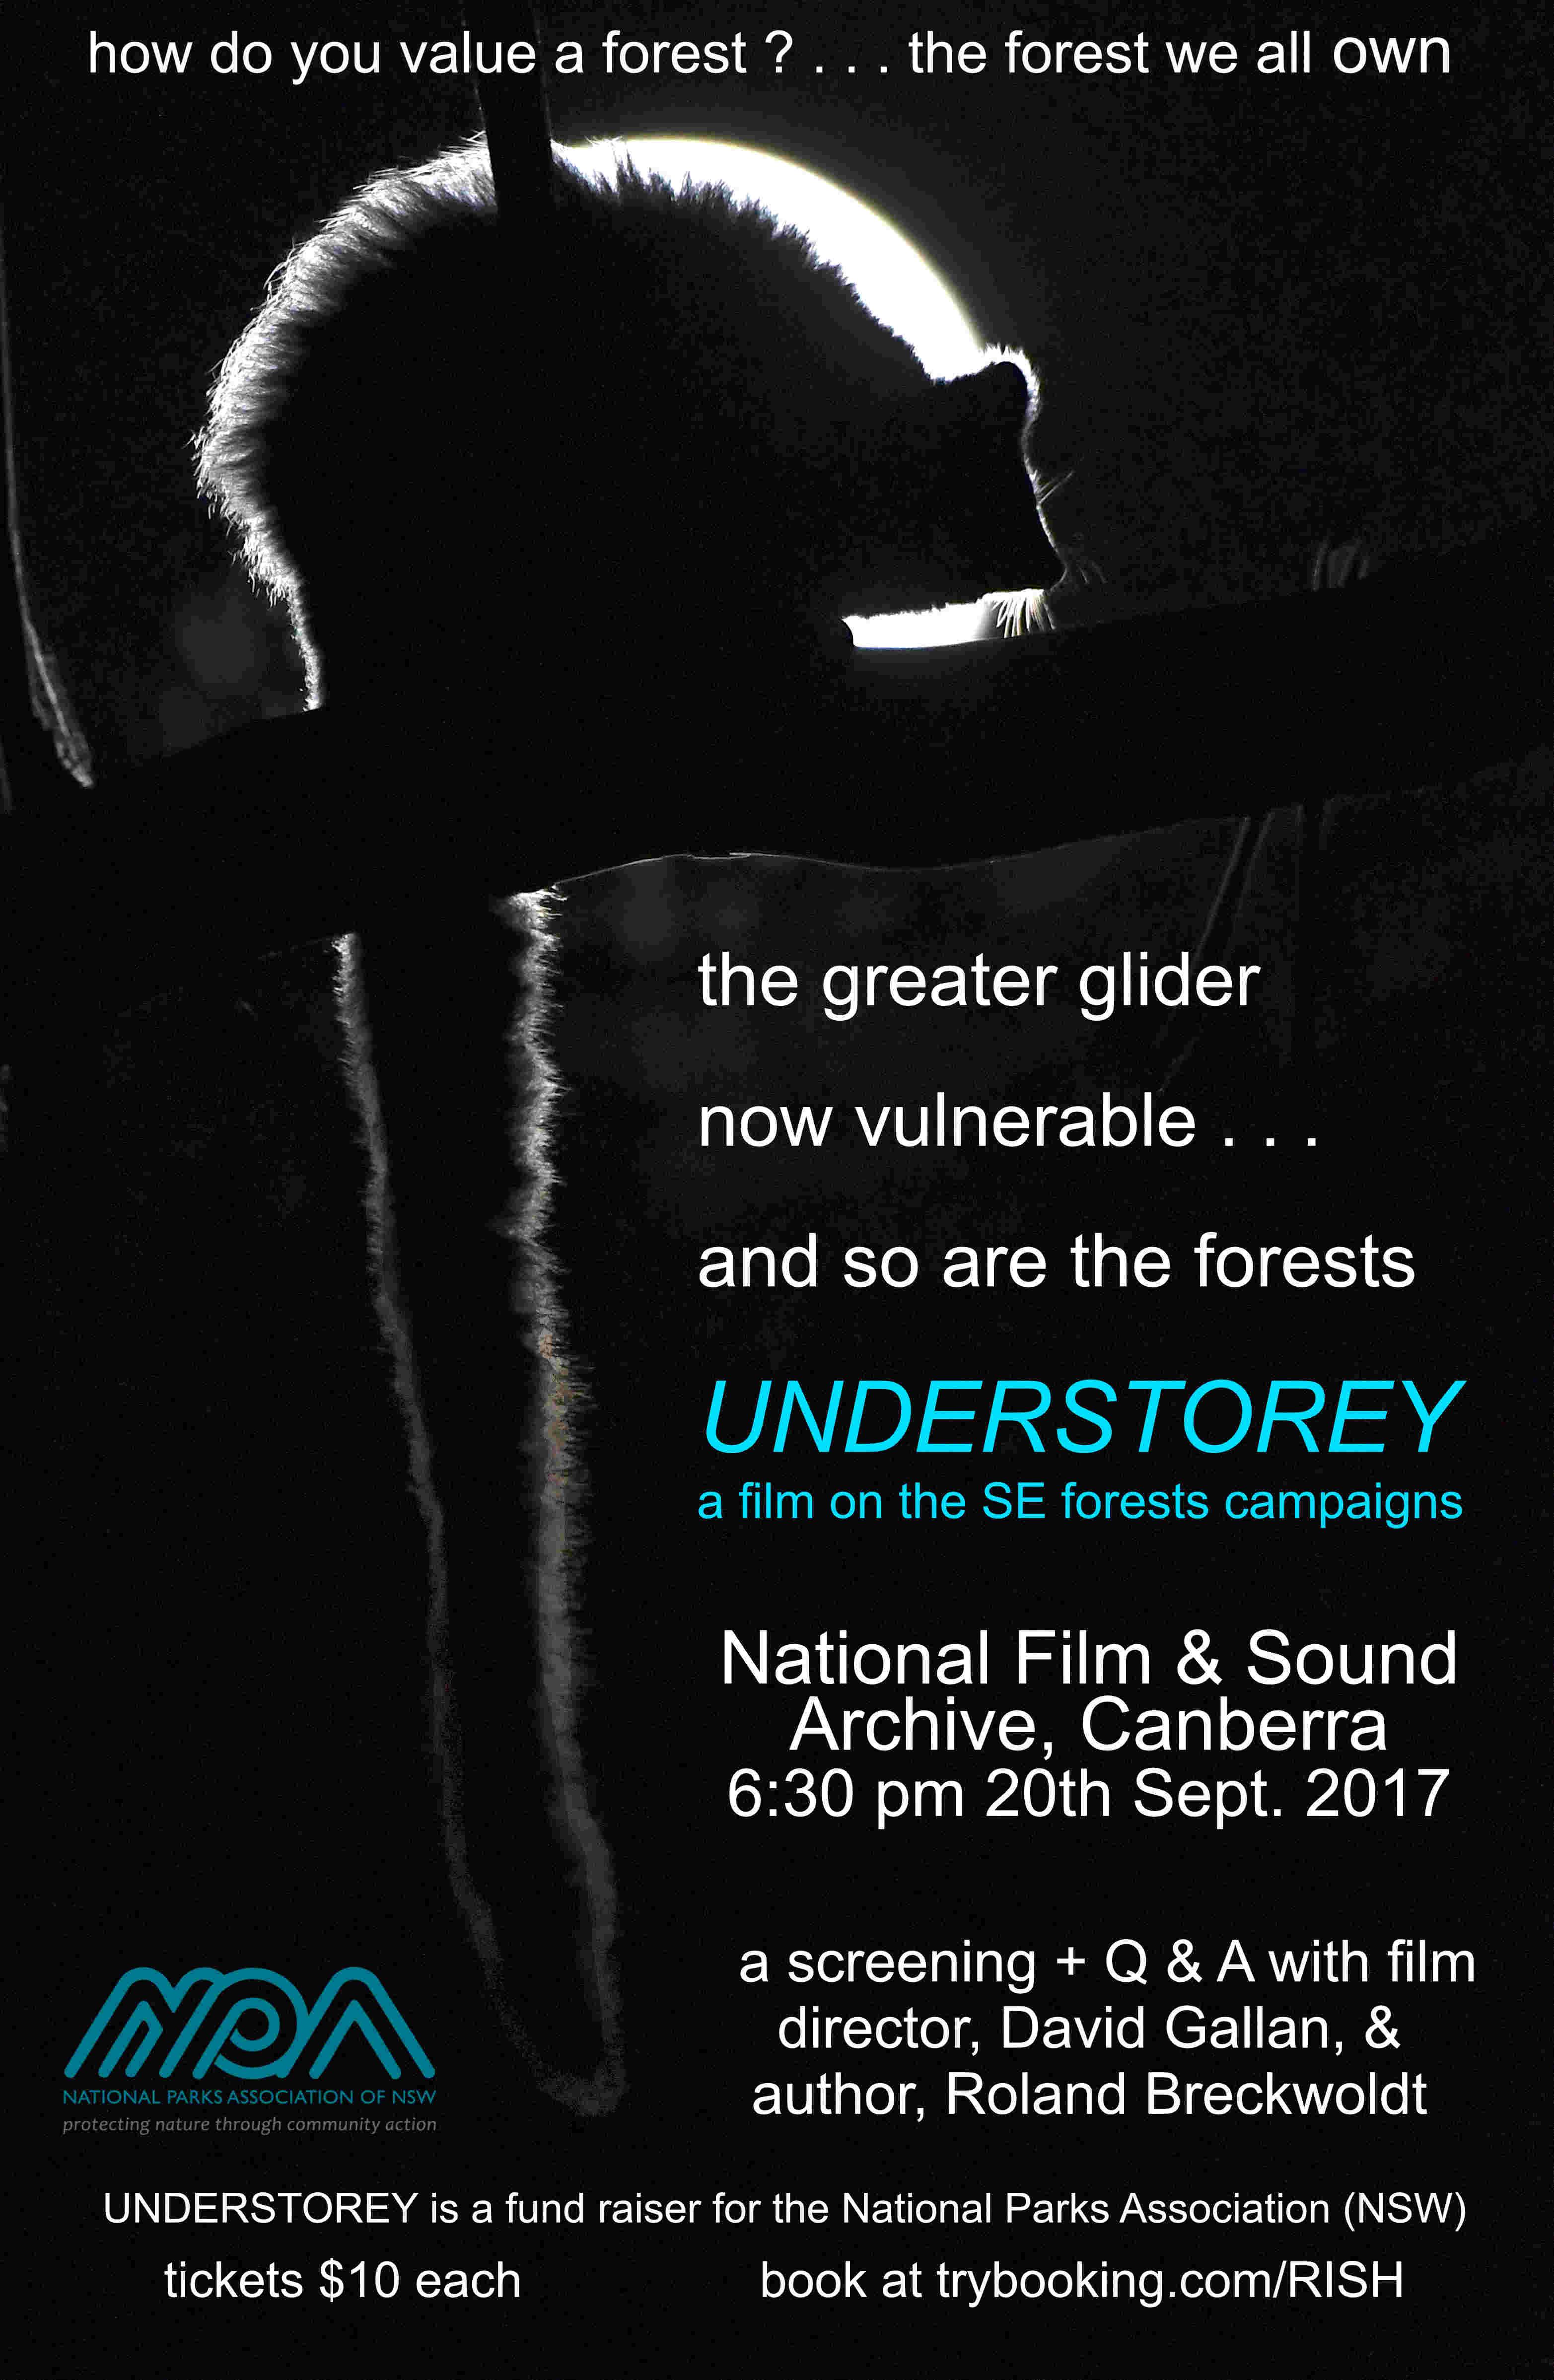 Film on Understorey, sponsored by NPA NSW, a K2C partner